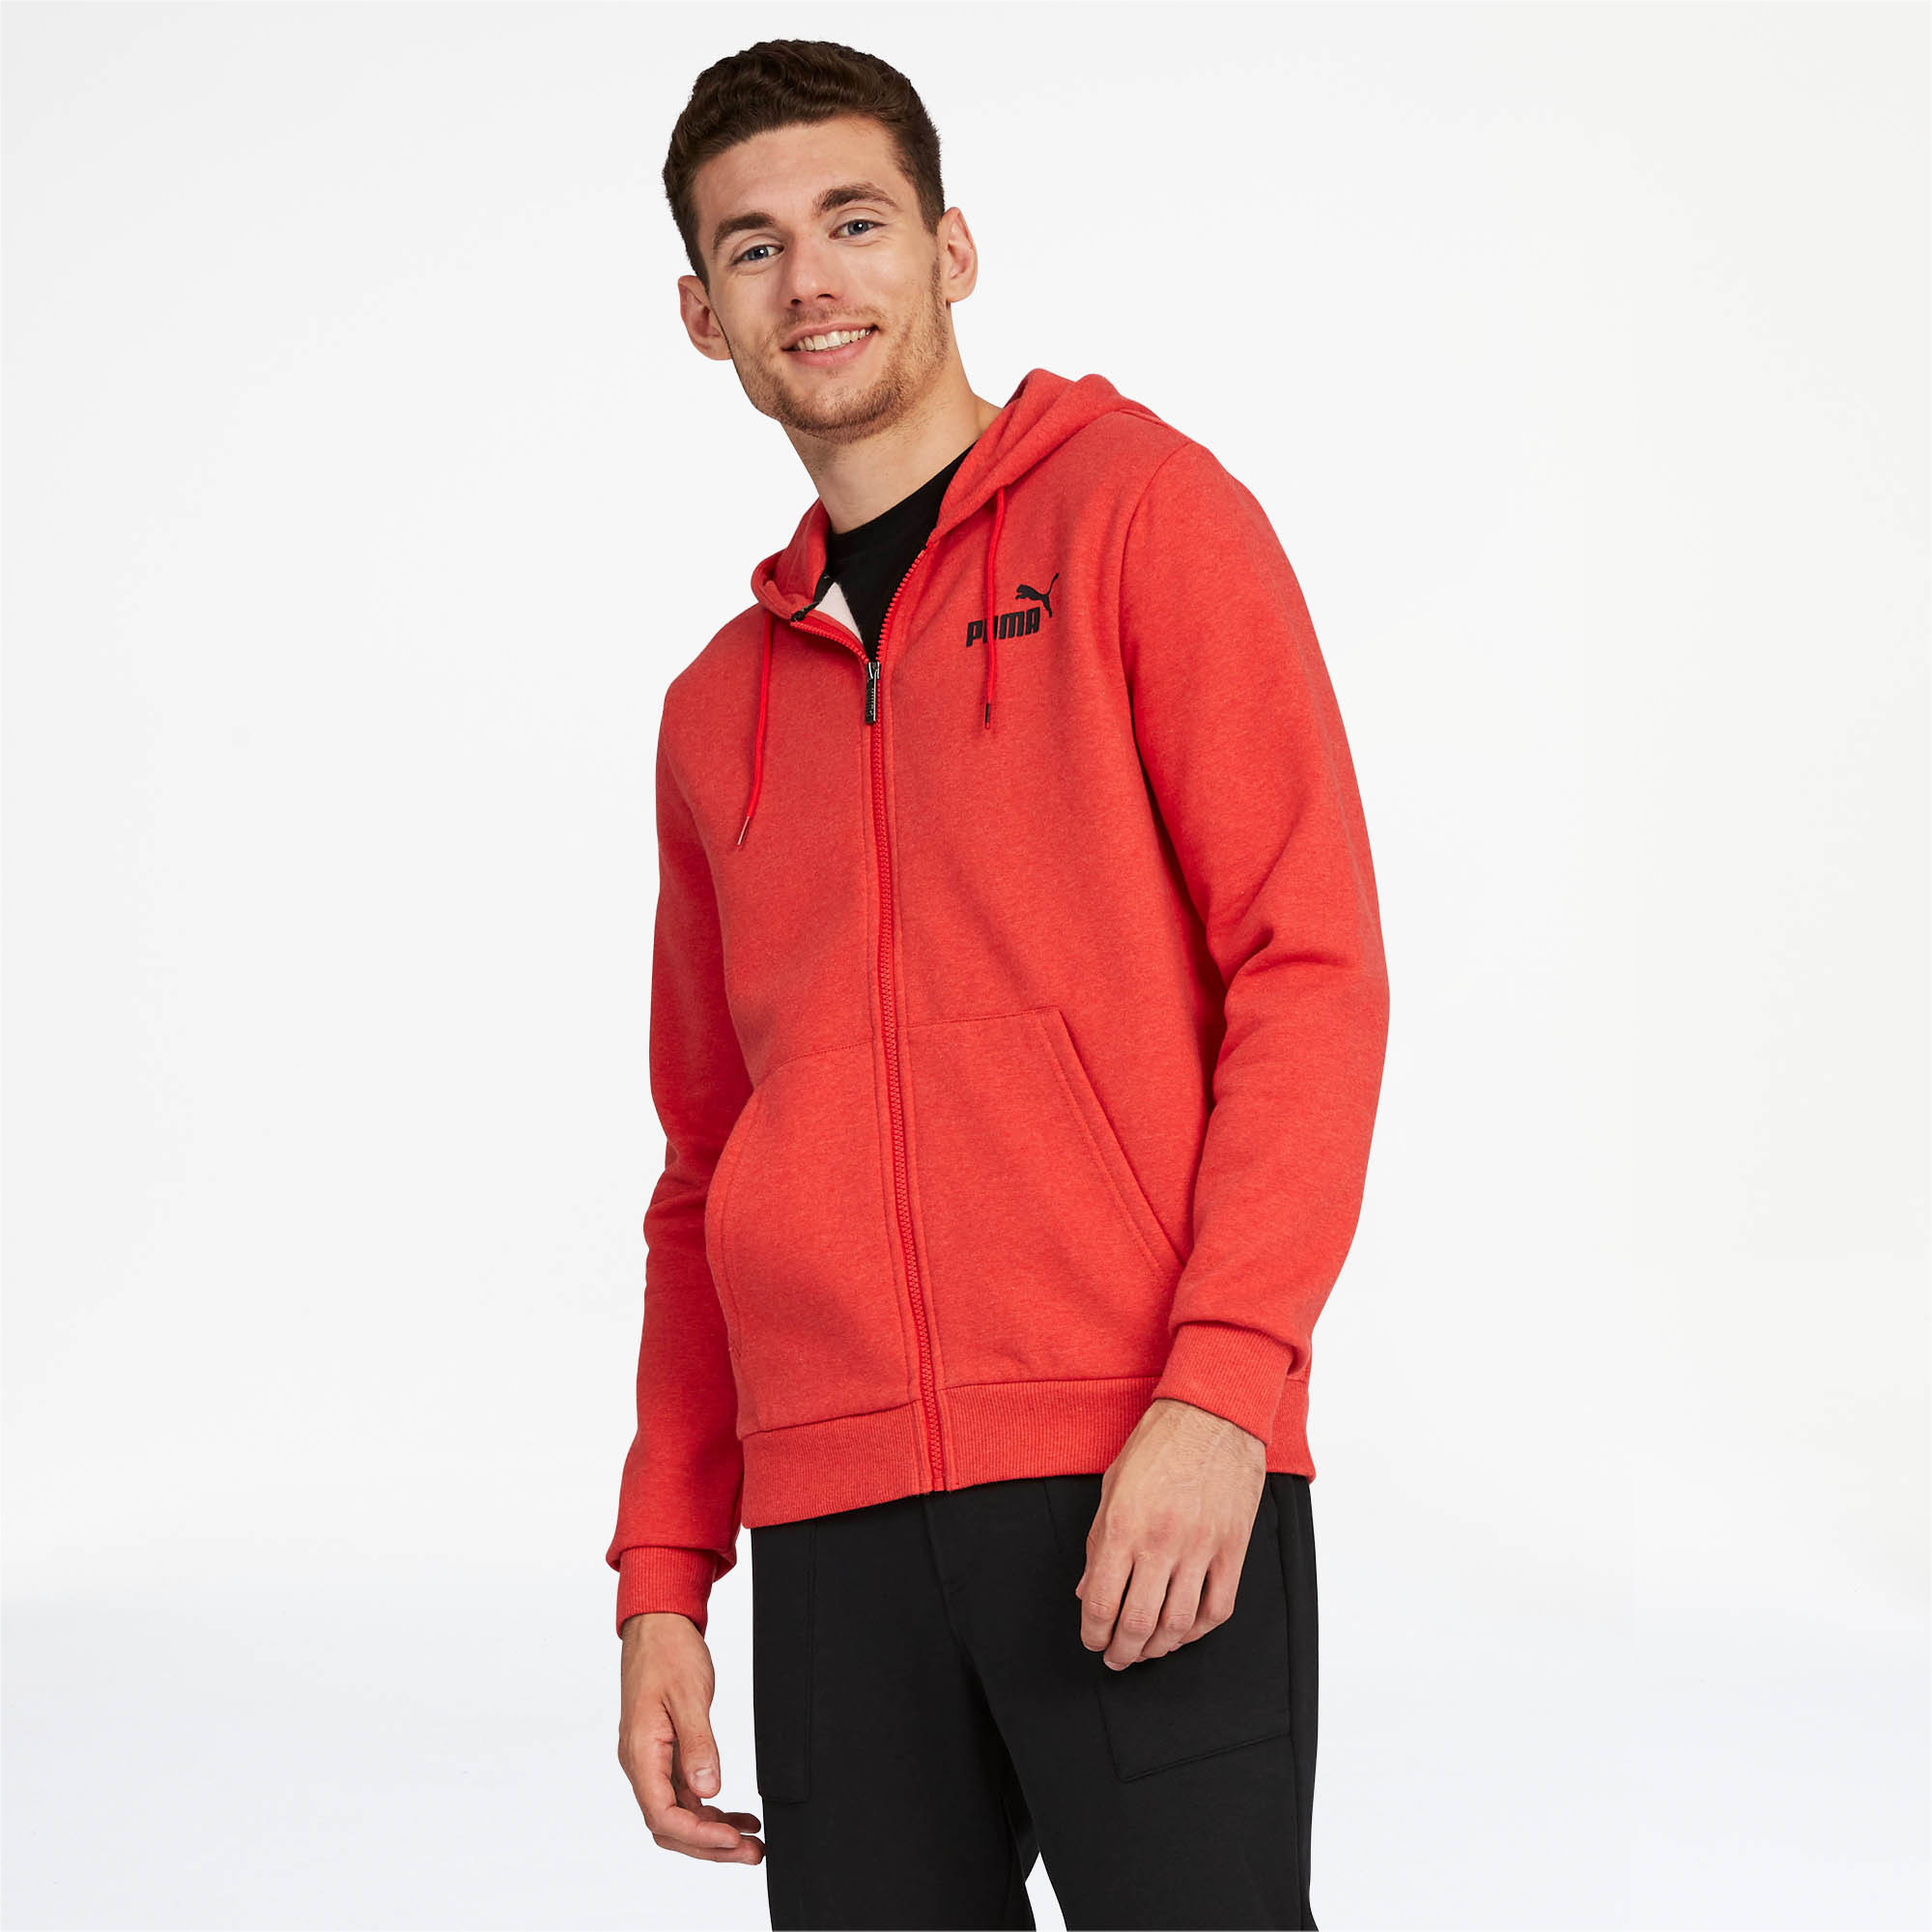 PUMA-Essentials-Men-039-s-Fleece-Hooded-Jacket-Men-Sweat-Basics thumbnail 11